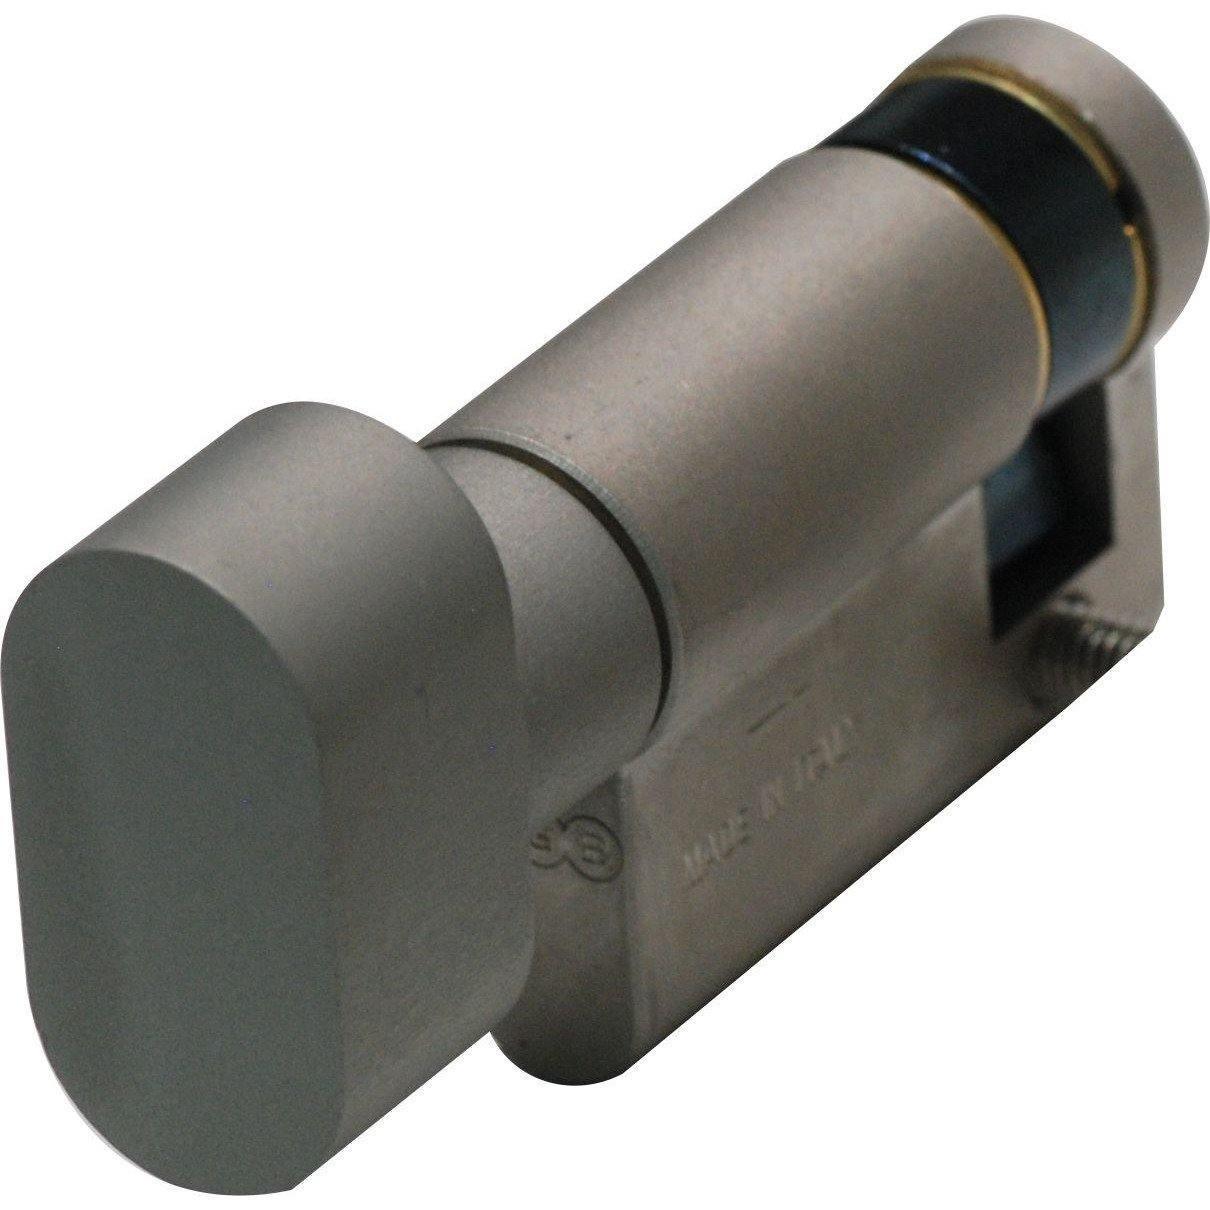 Half knob cylinder